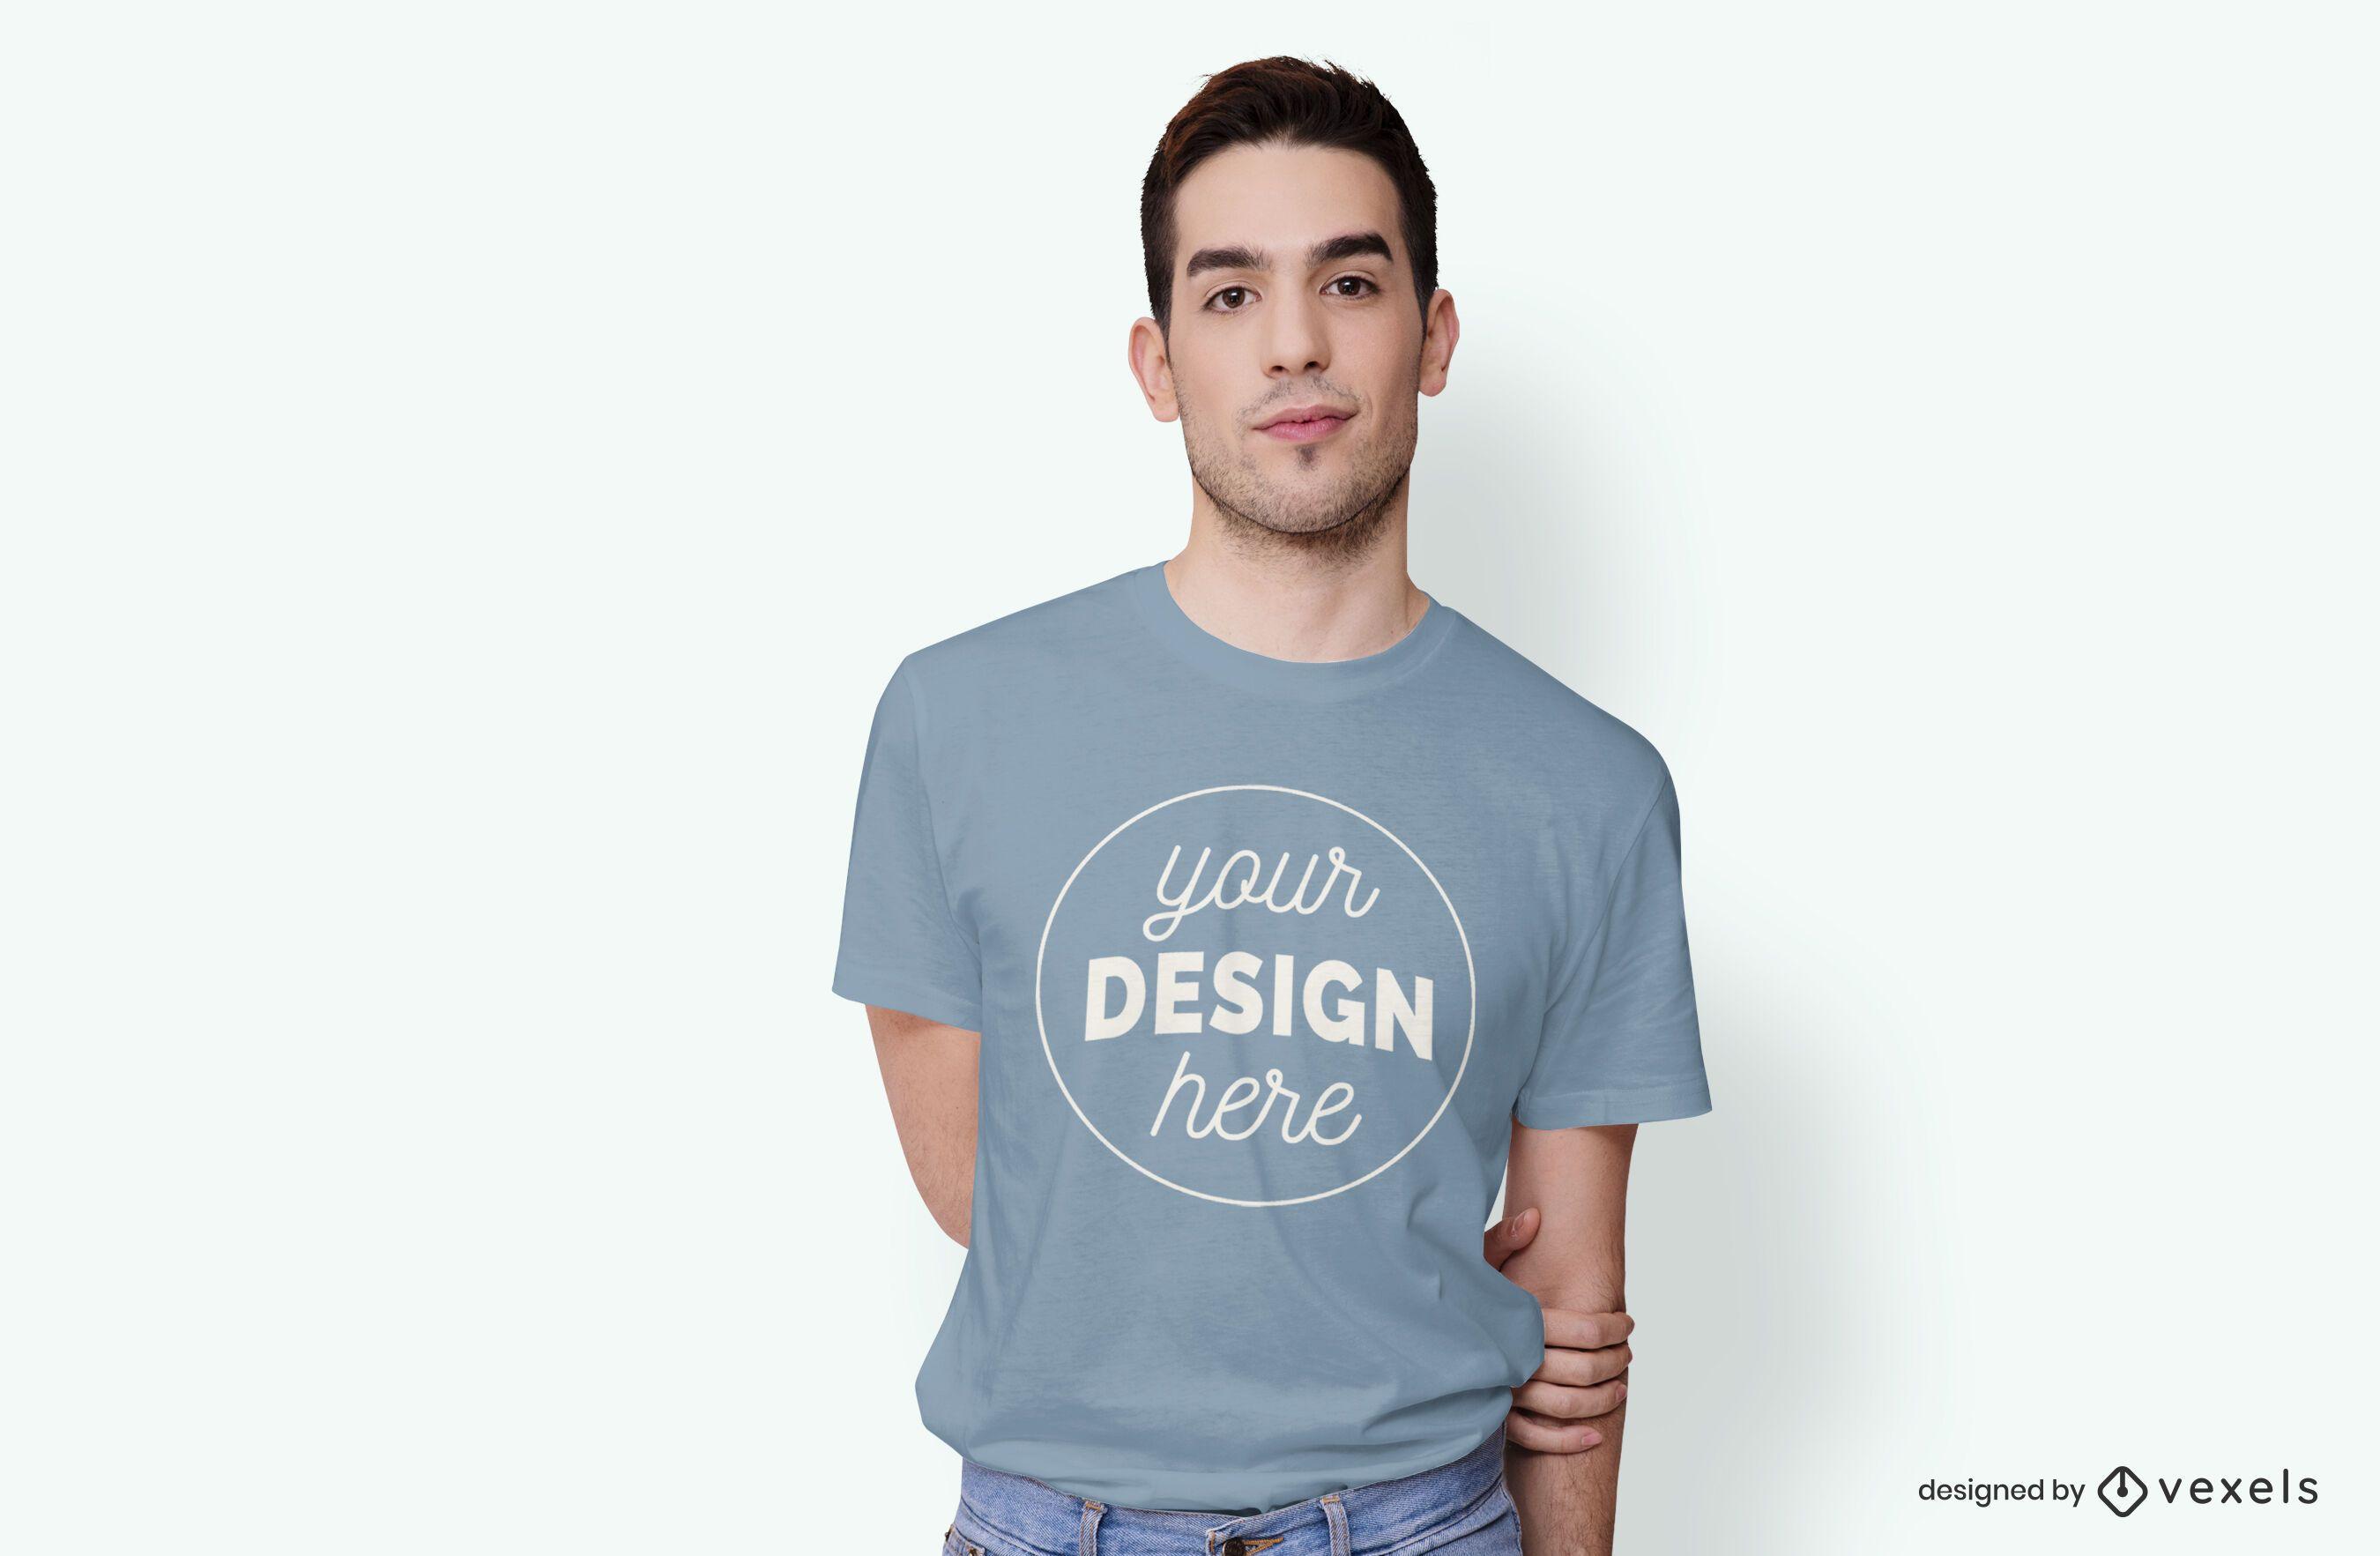 Männliches Modell T-Shirt Modell Design